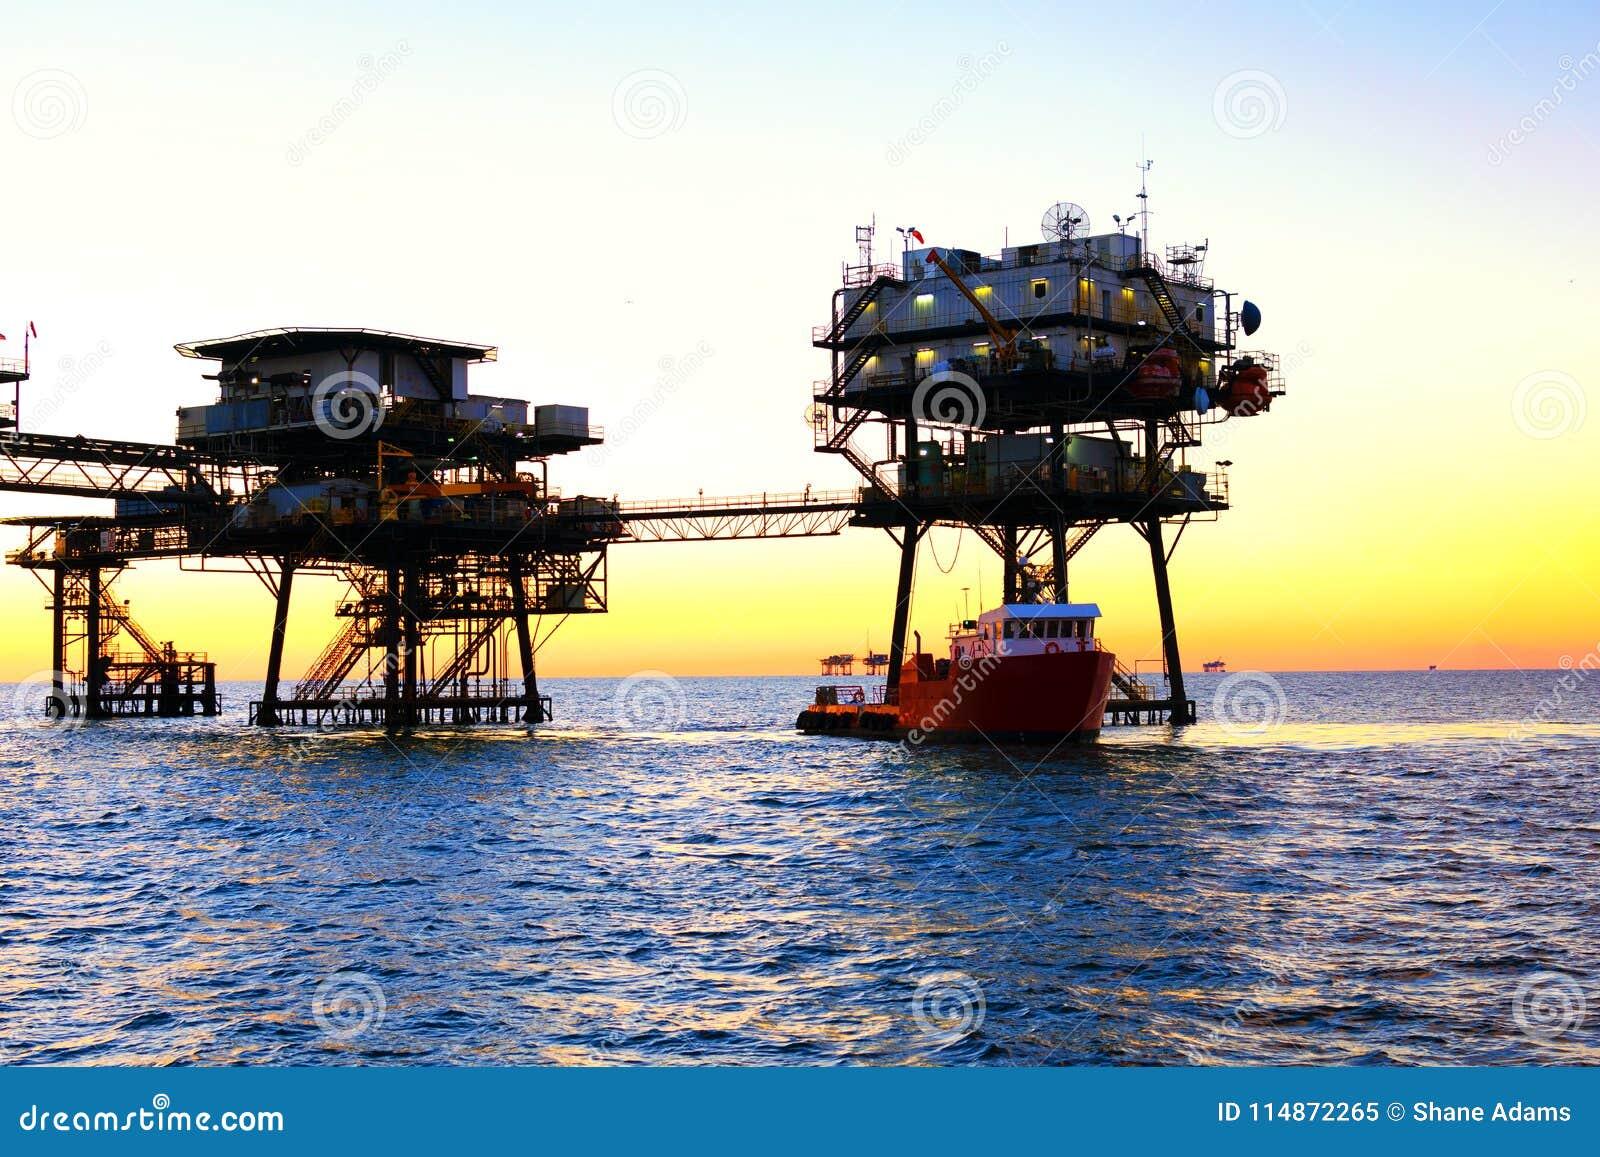 Offshore Oil Platform stock image  Image of ocean, steel